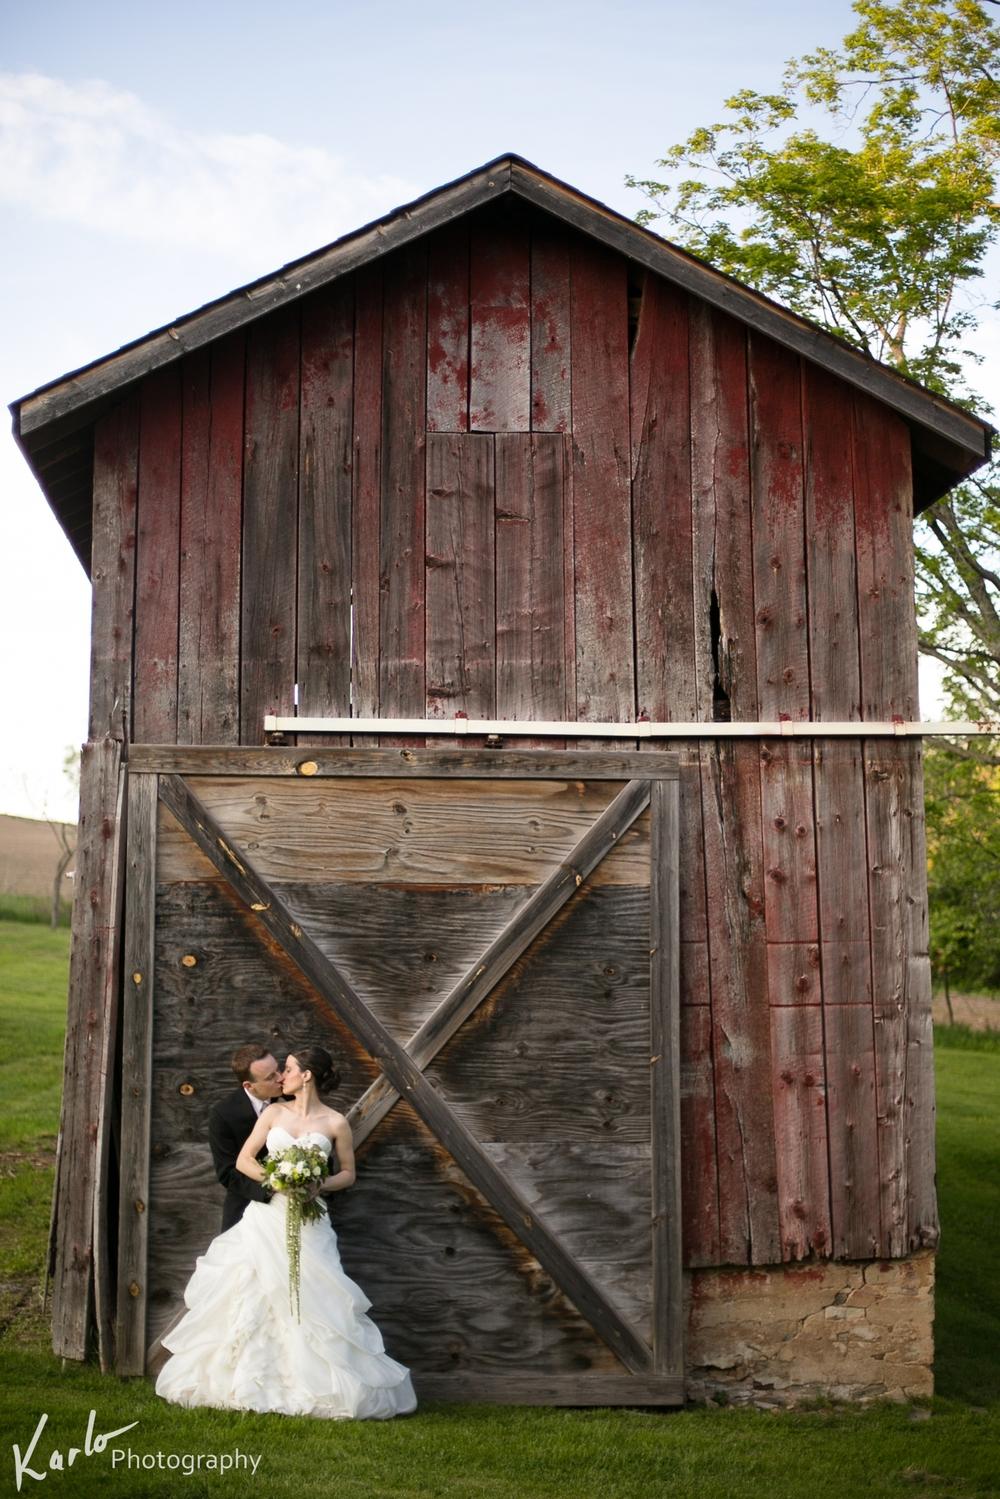 Karlo Photography Deep Creek Lake Wedding Photographer Photography Chanteclaire 0018.jpg